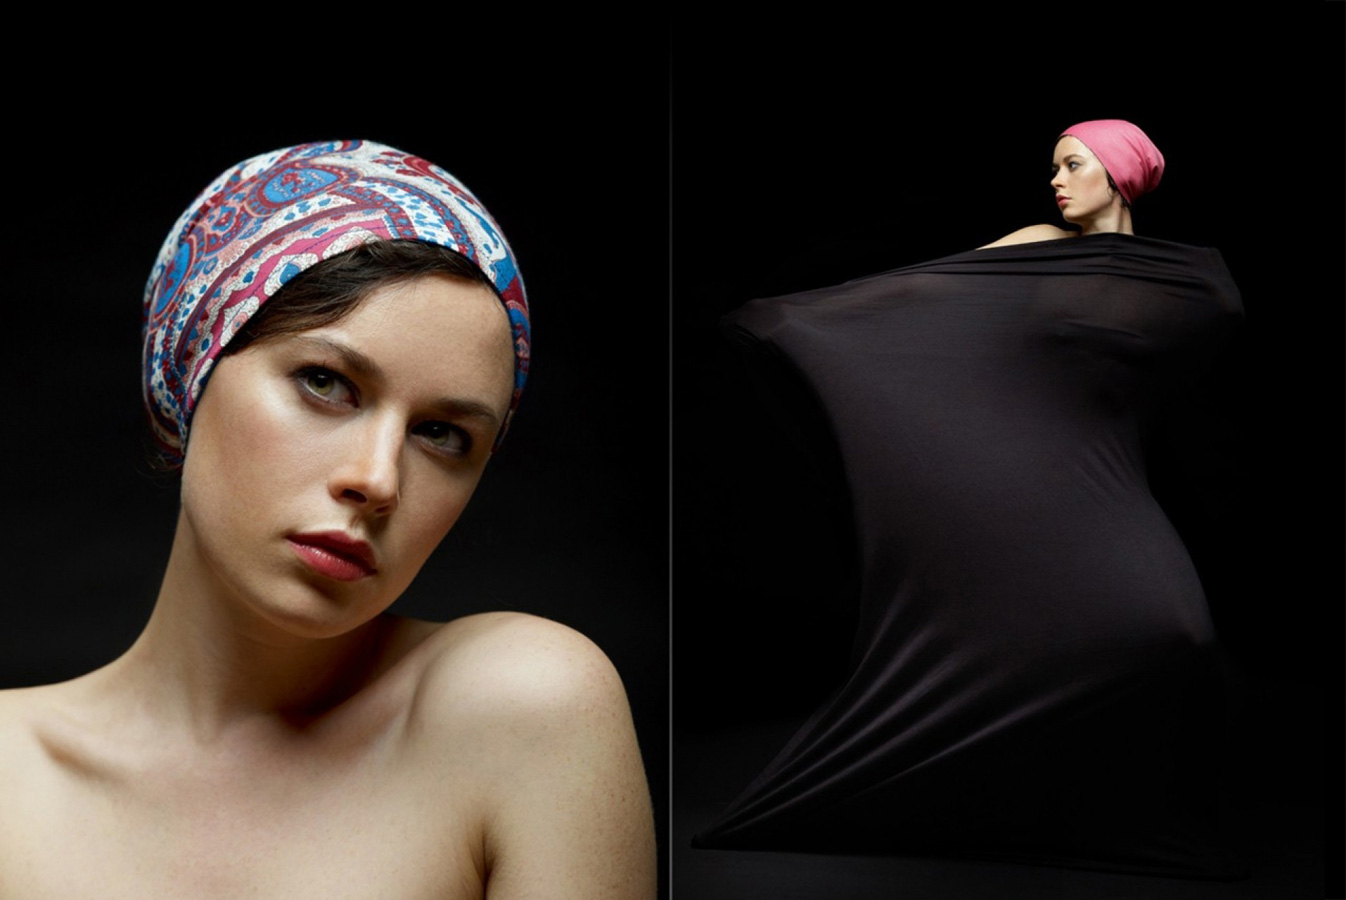 Каталог шапок. Фотосъемка одежды, фотограф Лена Волкова